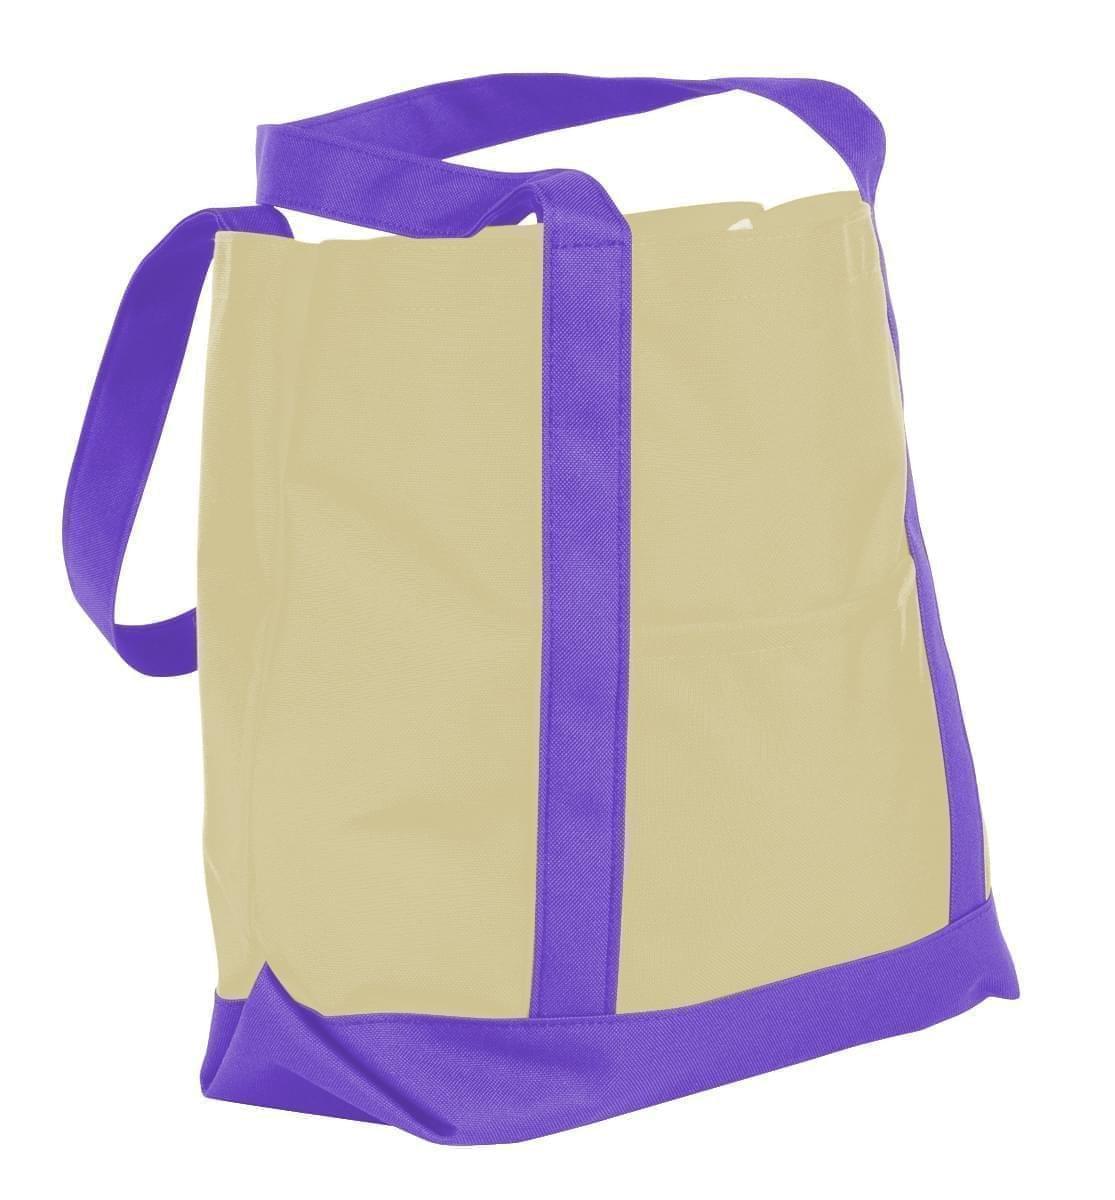 USA Made Canvas Fashion Tote Bags, Natural-Purple, XAACL1UAKK